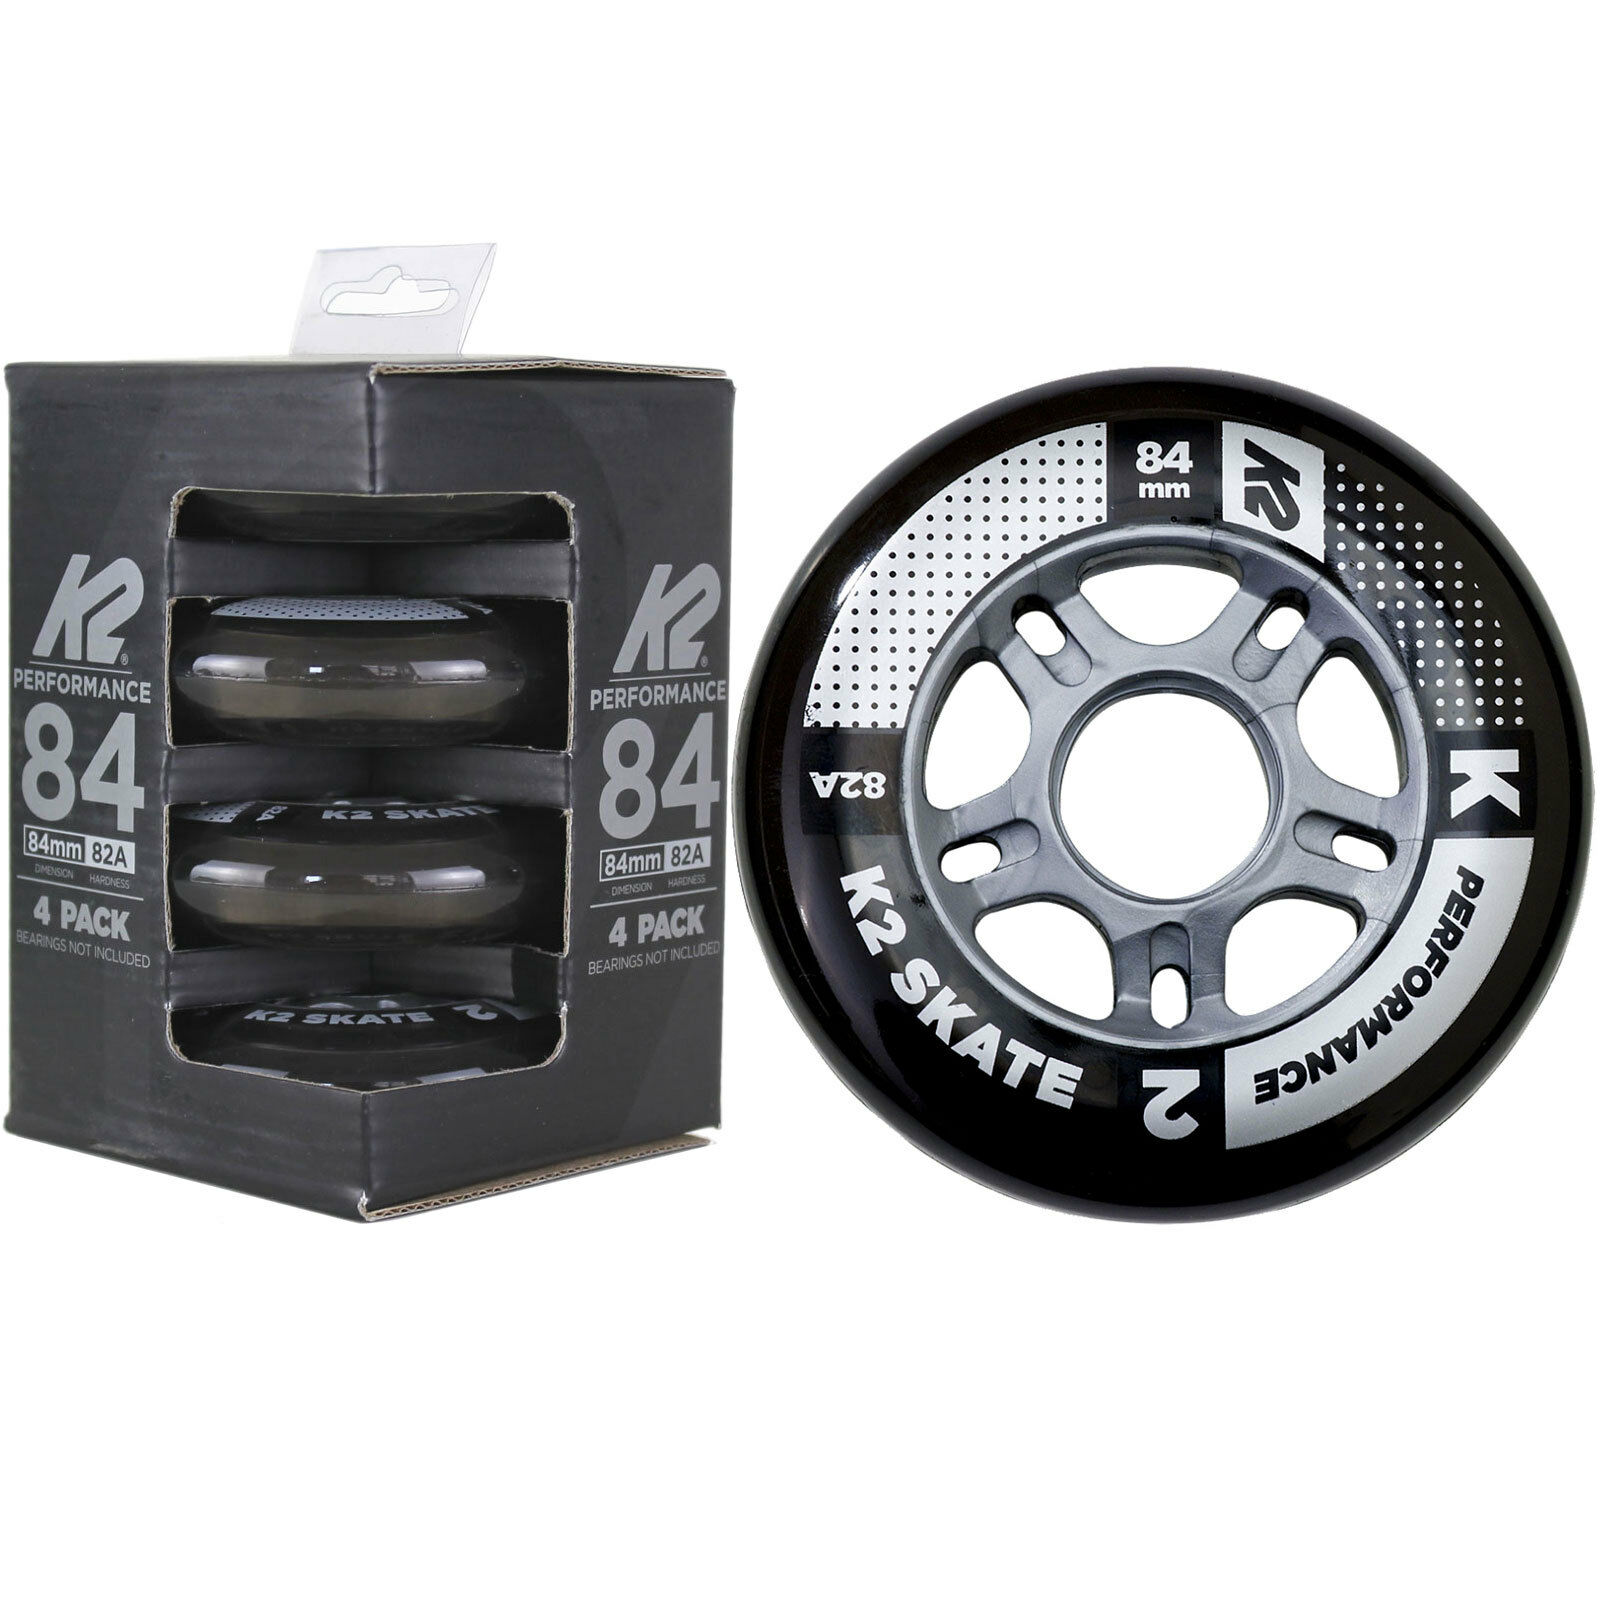 K2/Rollers 84/mm Performance Wheel Pack de 4/Rollers Rouleaux de Rechange 4/30b3003.1.1